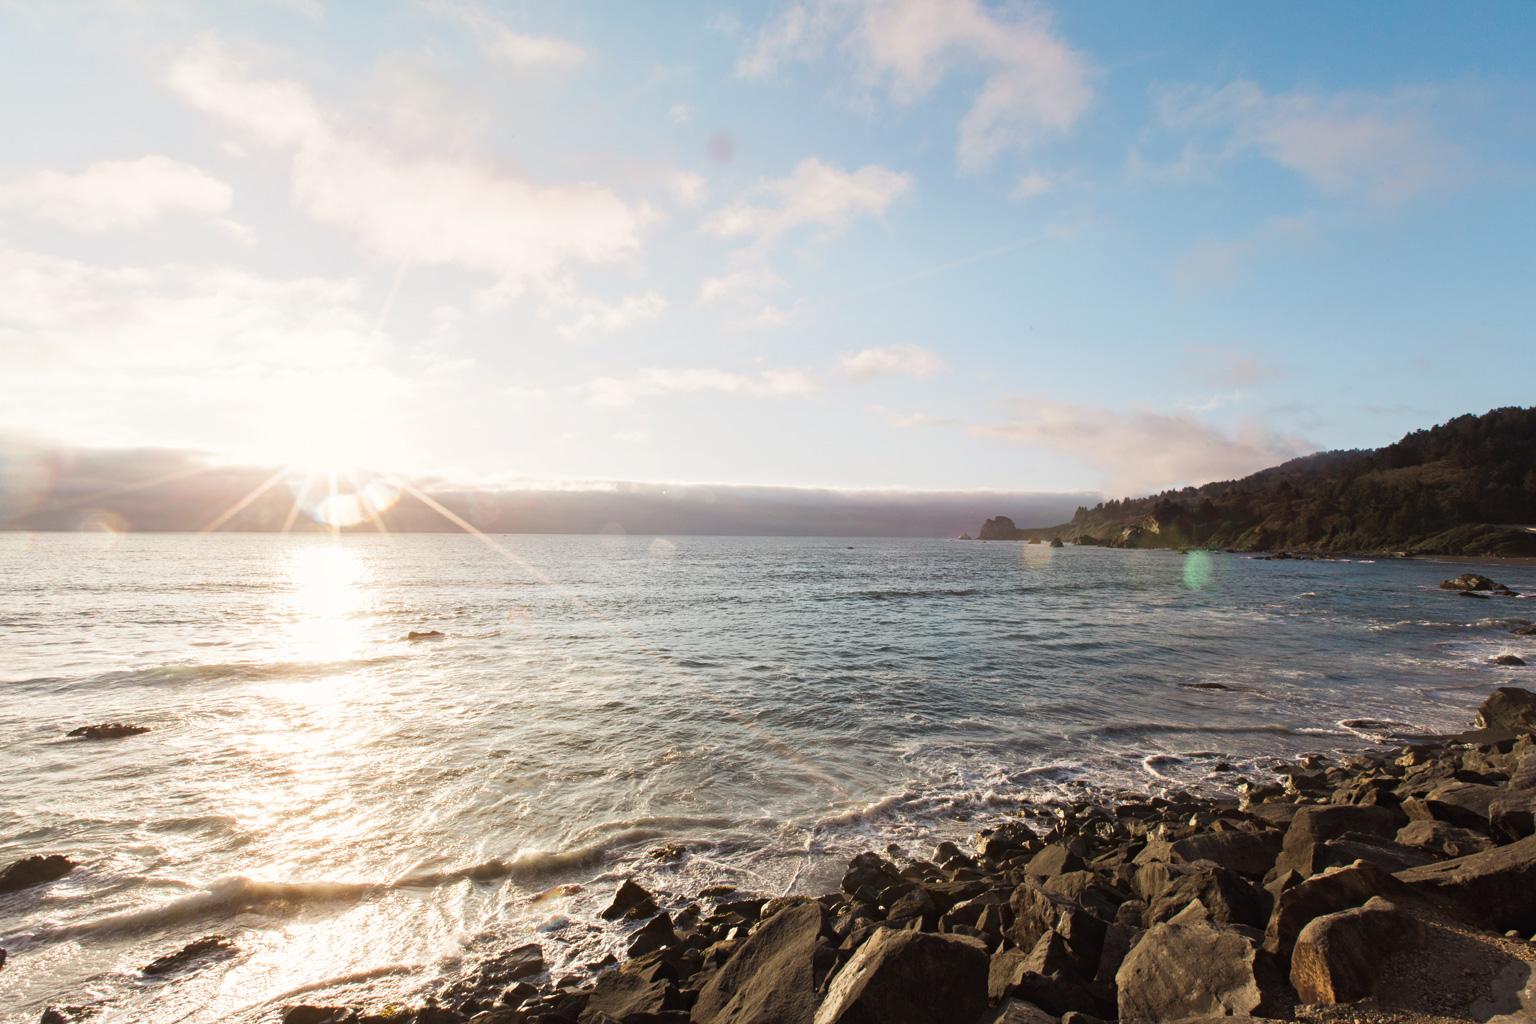 CindyGiovagnoli_Crater_Lake_National_Park_Cape_Perpetua_Heceta_Head_lighthouse_Pacific_Ocean_Cannon_Beach_haystack_Oregon_coast-003.jpg